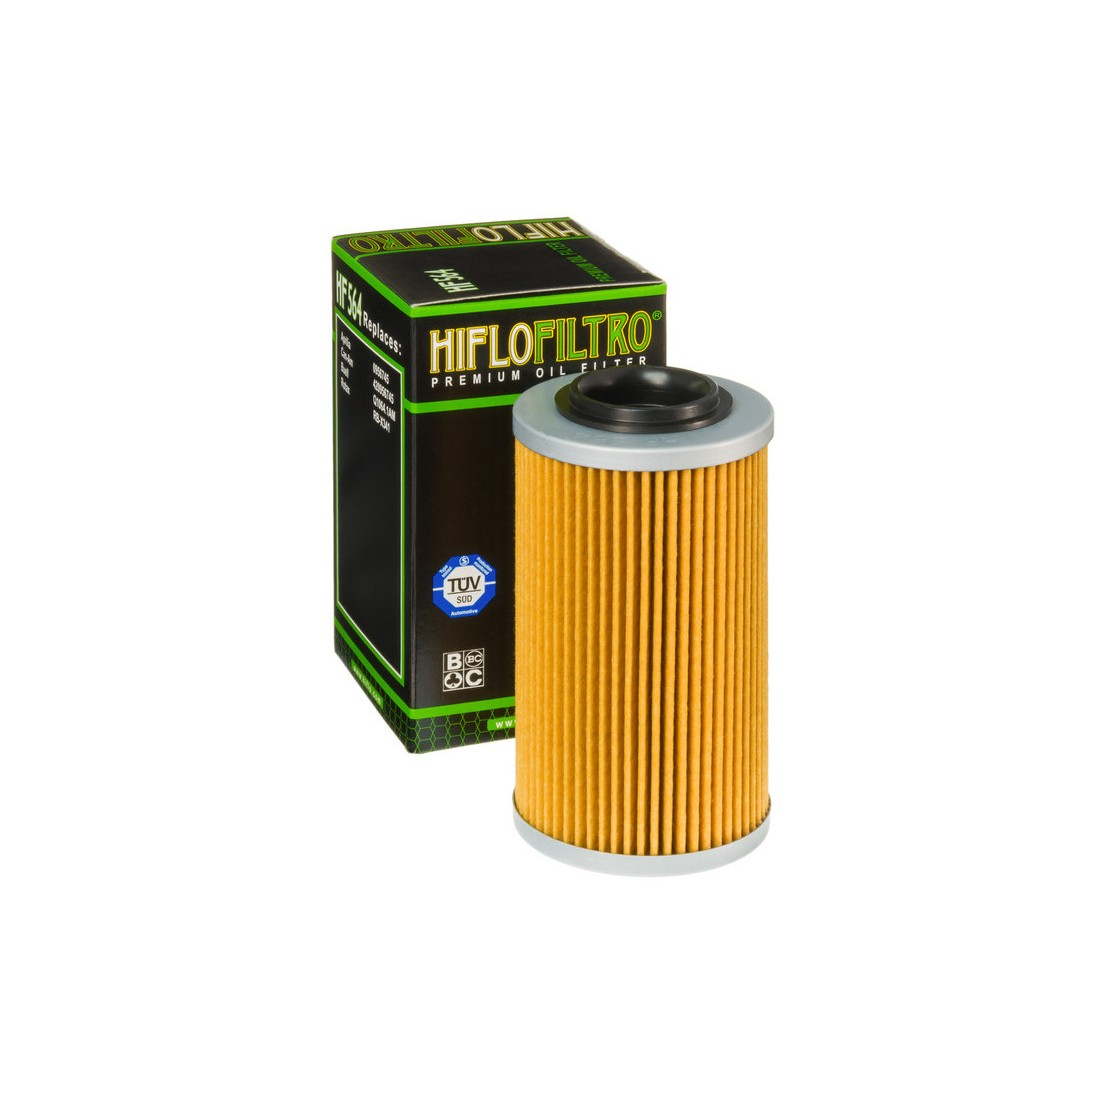 Filtro Aceite Hiflofiltro HF564